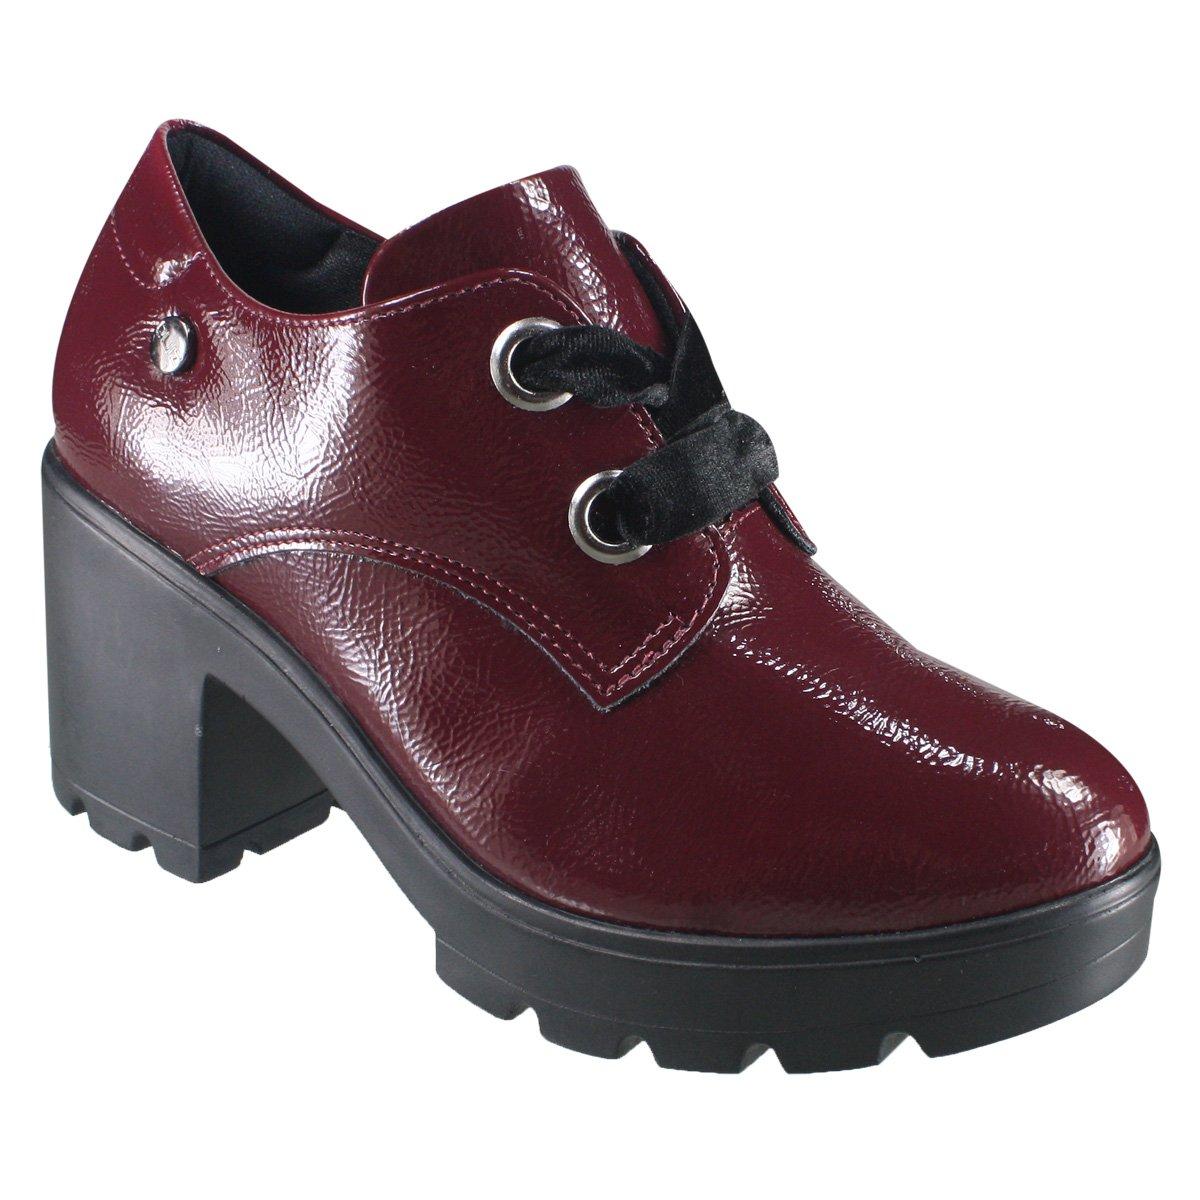 353c98e3e9 Sapato Feminino Oxford Quiz 69-69230 - Bordo (Verniz Show ...